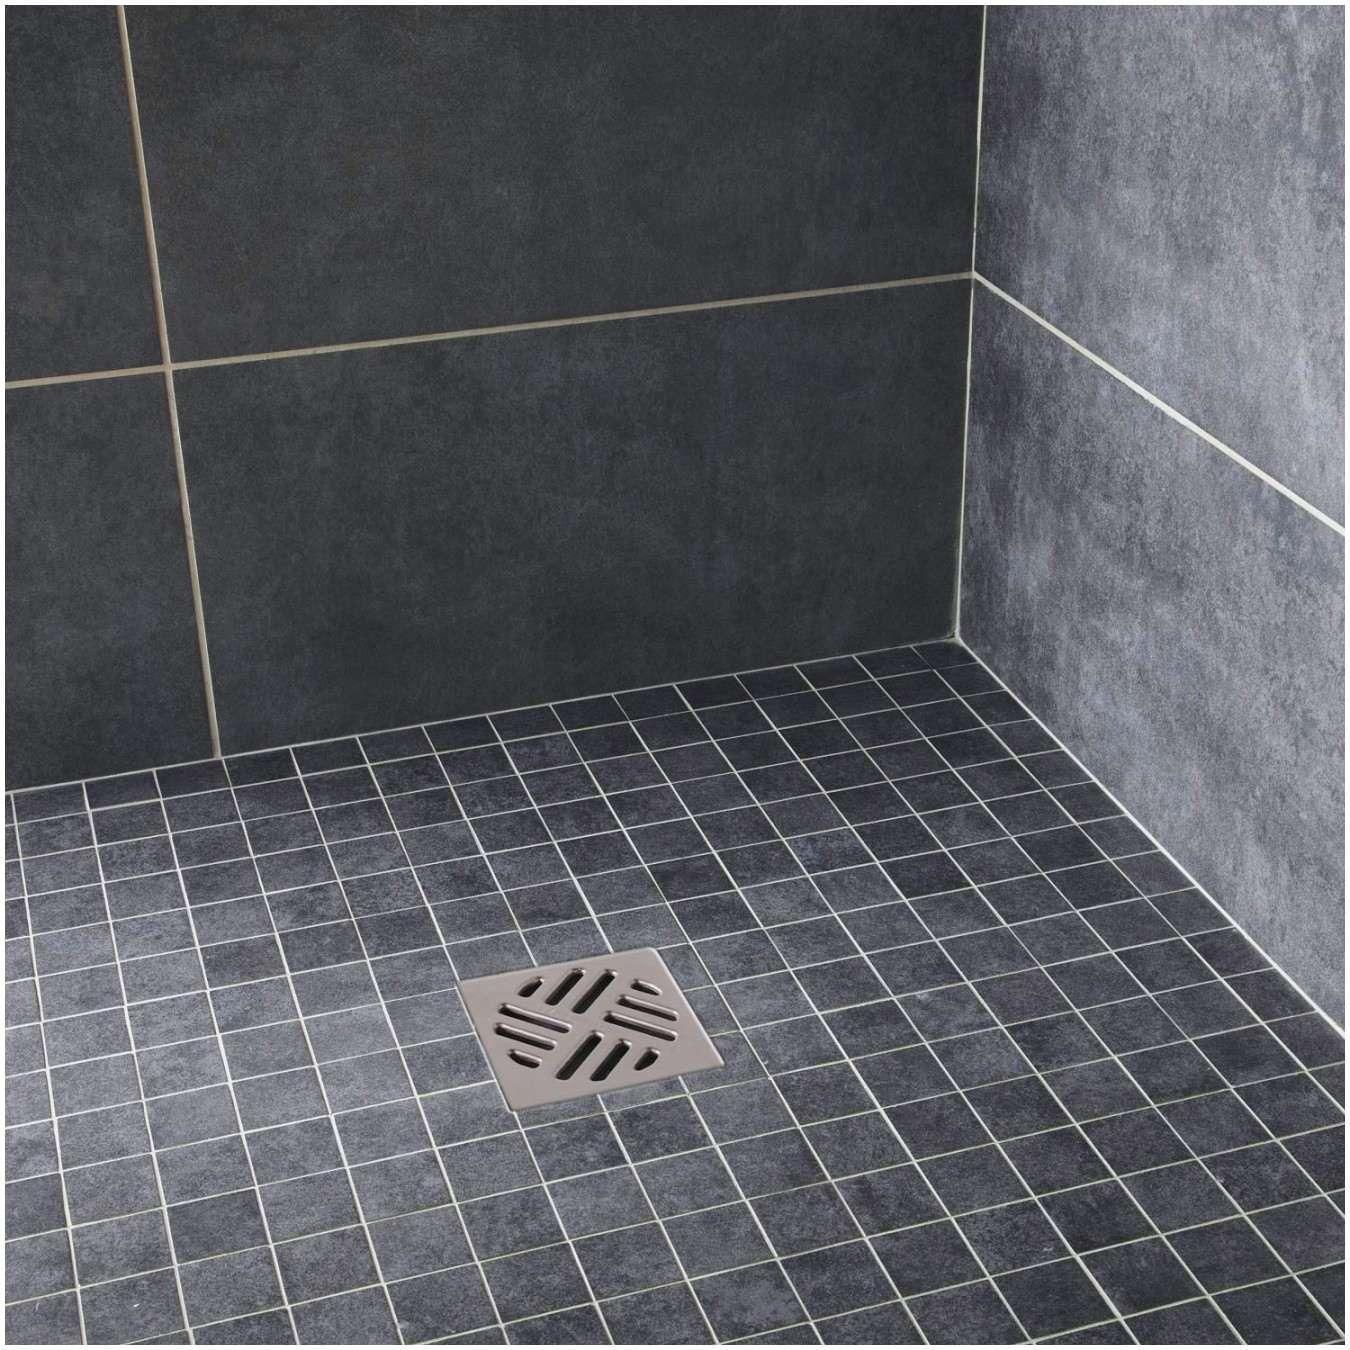 Tapis De Baignoire Antiderapant Leroy Merlin Qui A L Air Cher Mosaic Shower Tile Master Bathroom Renovation Shower